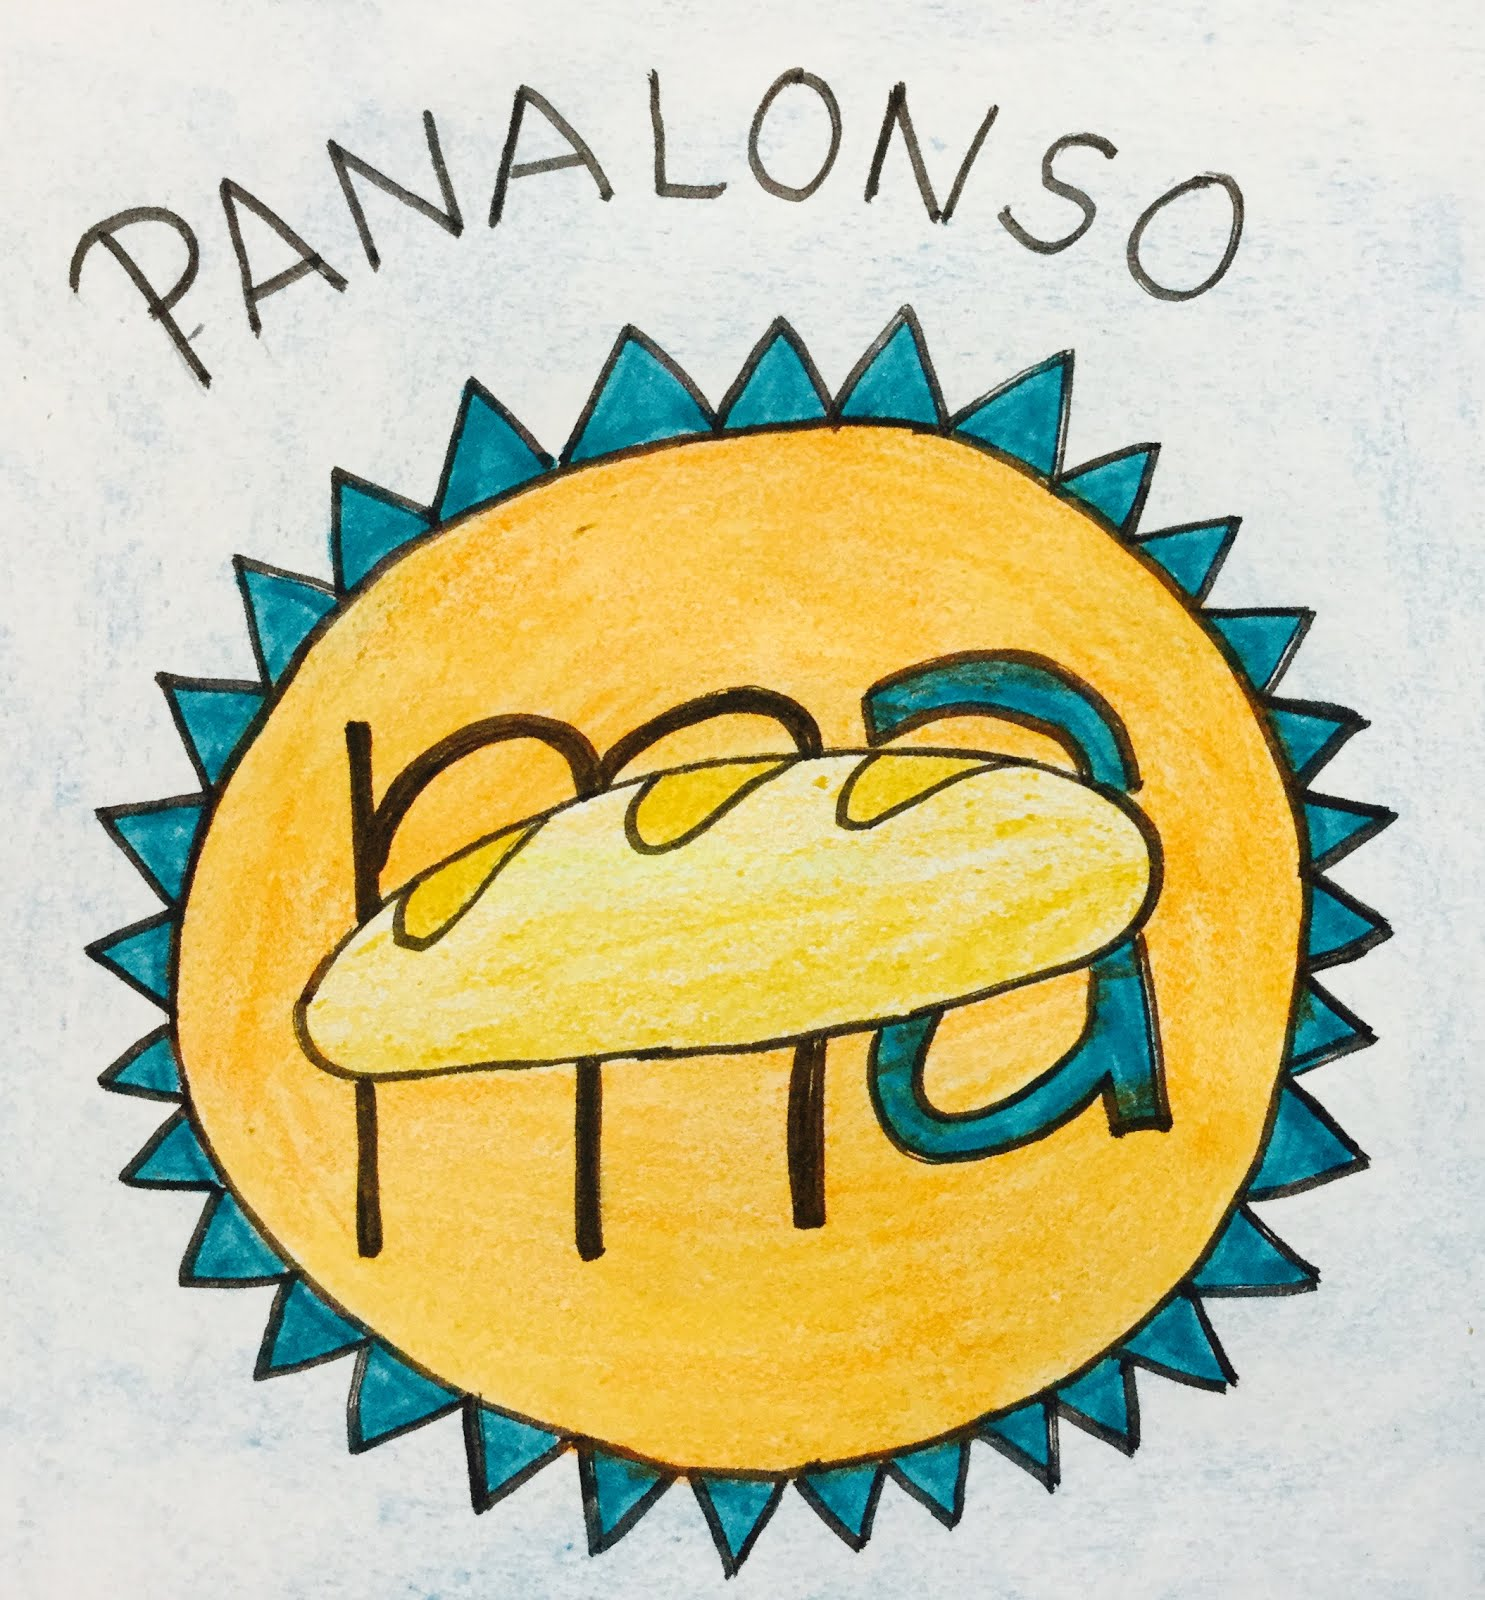 Proyecto "Pan"